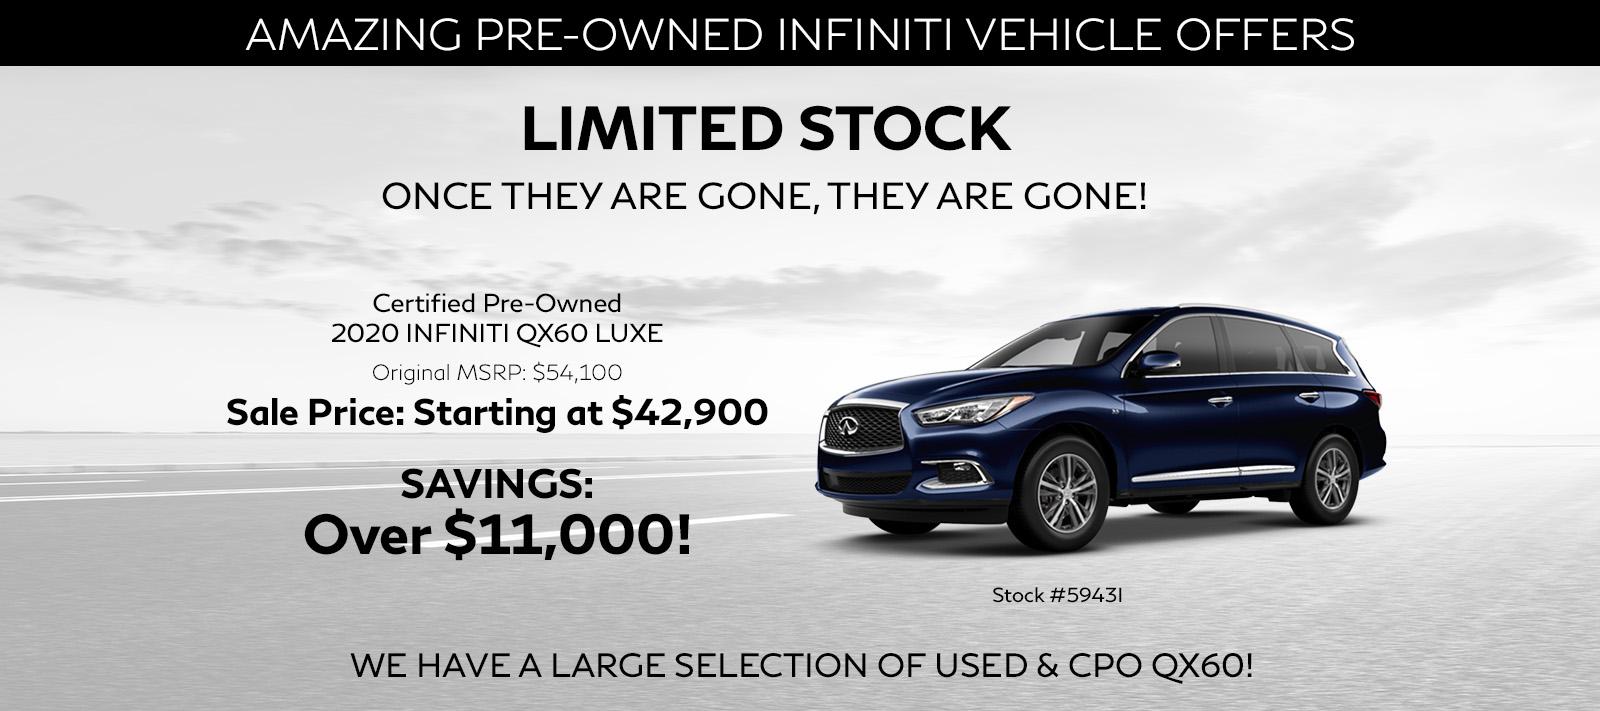 2016 INFINITI QX60 suv starting at $23,000